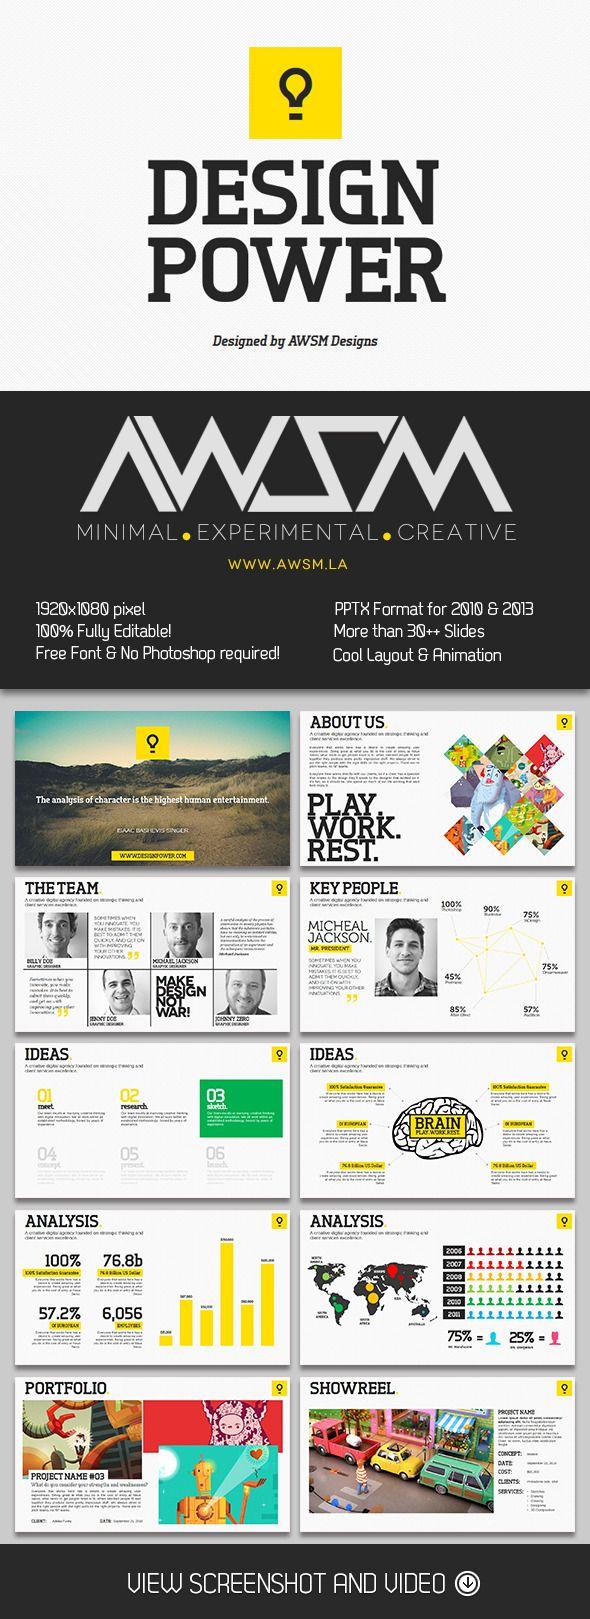 Design Power PowerPoint Template | Creative